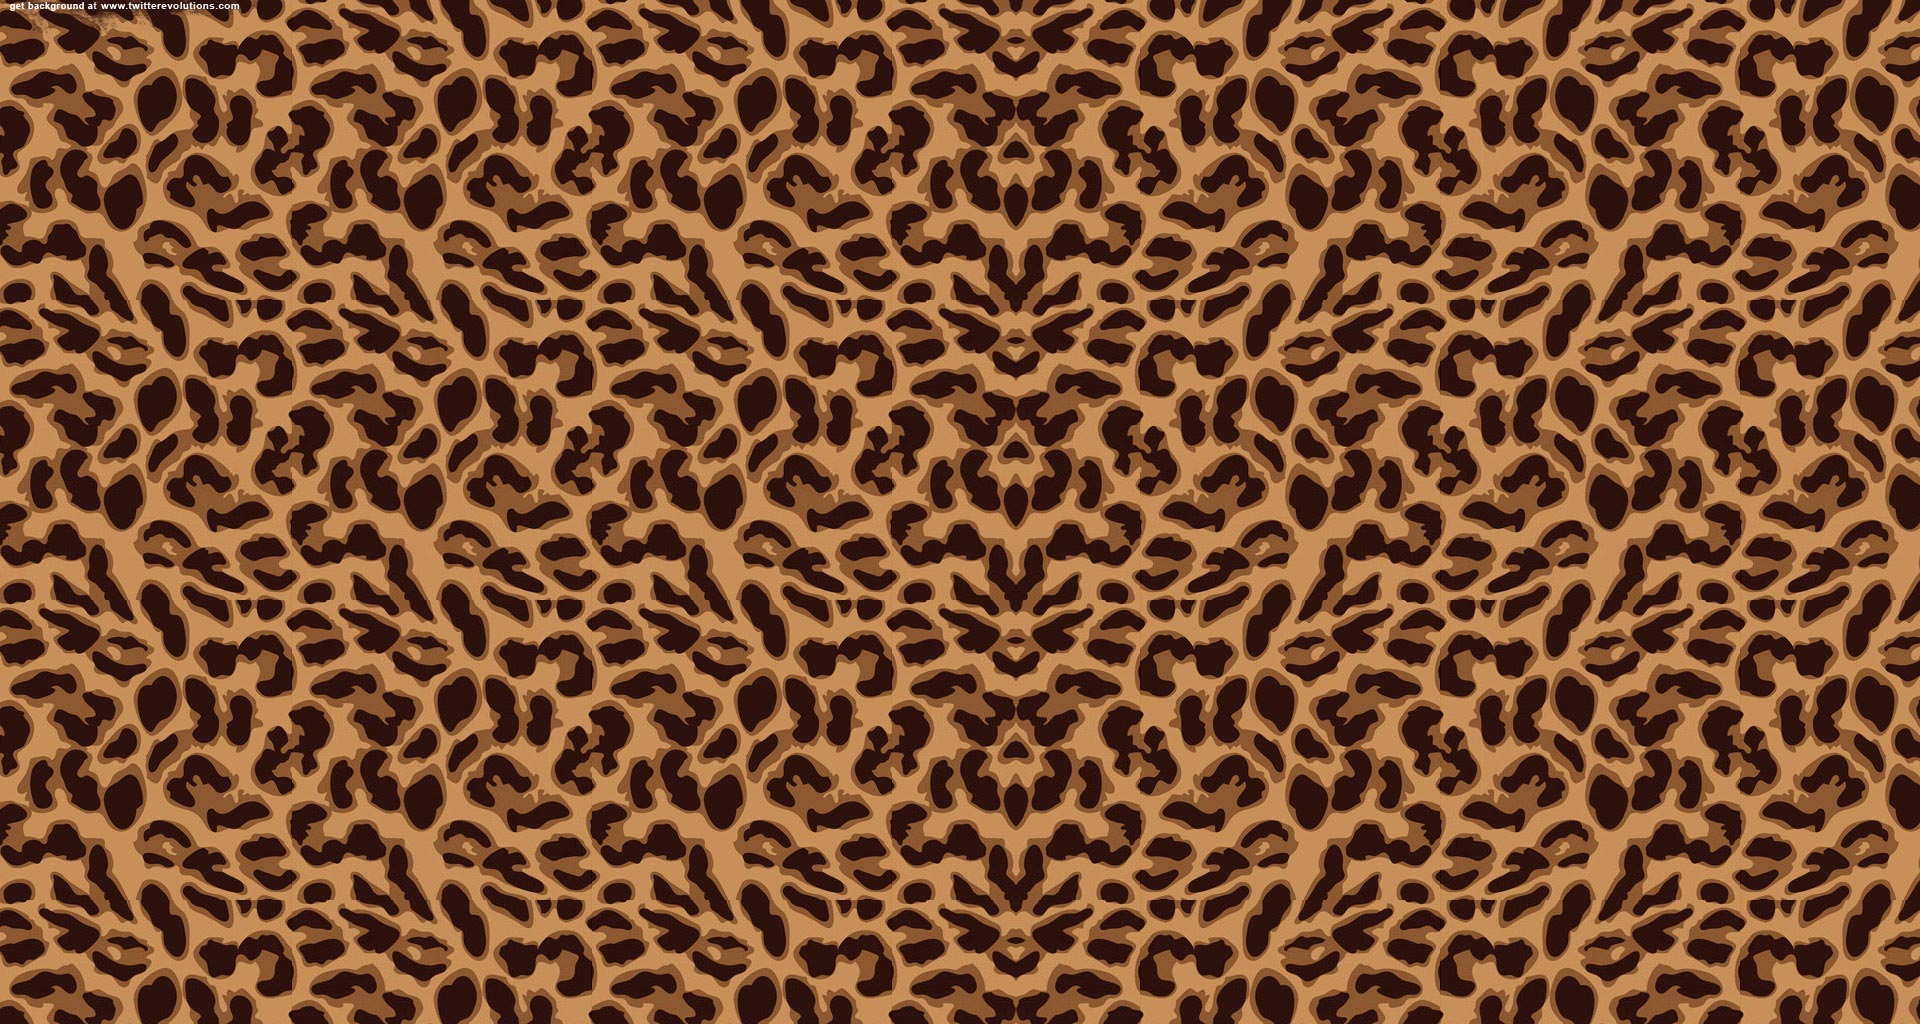 Leopard background wallpapersafari for Leopard print wallpaper